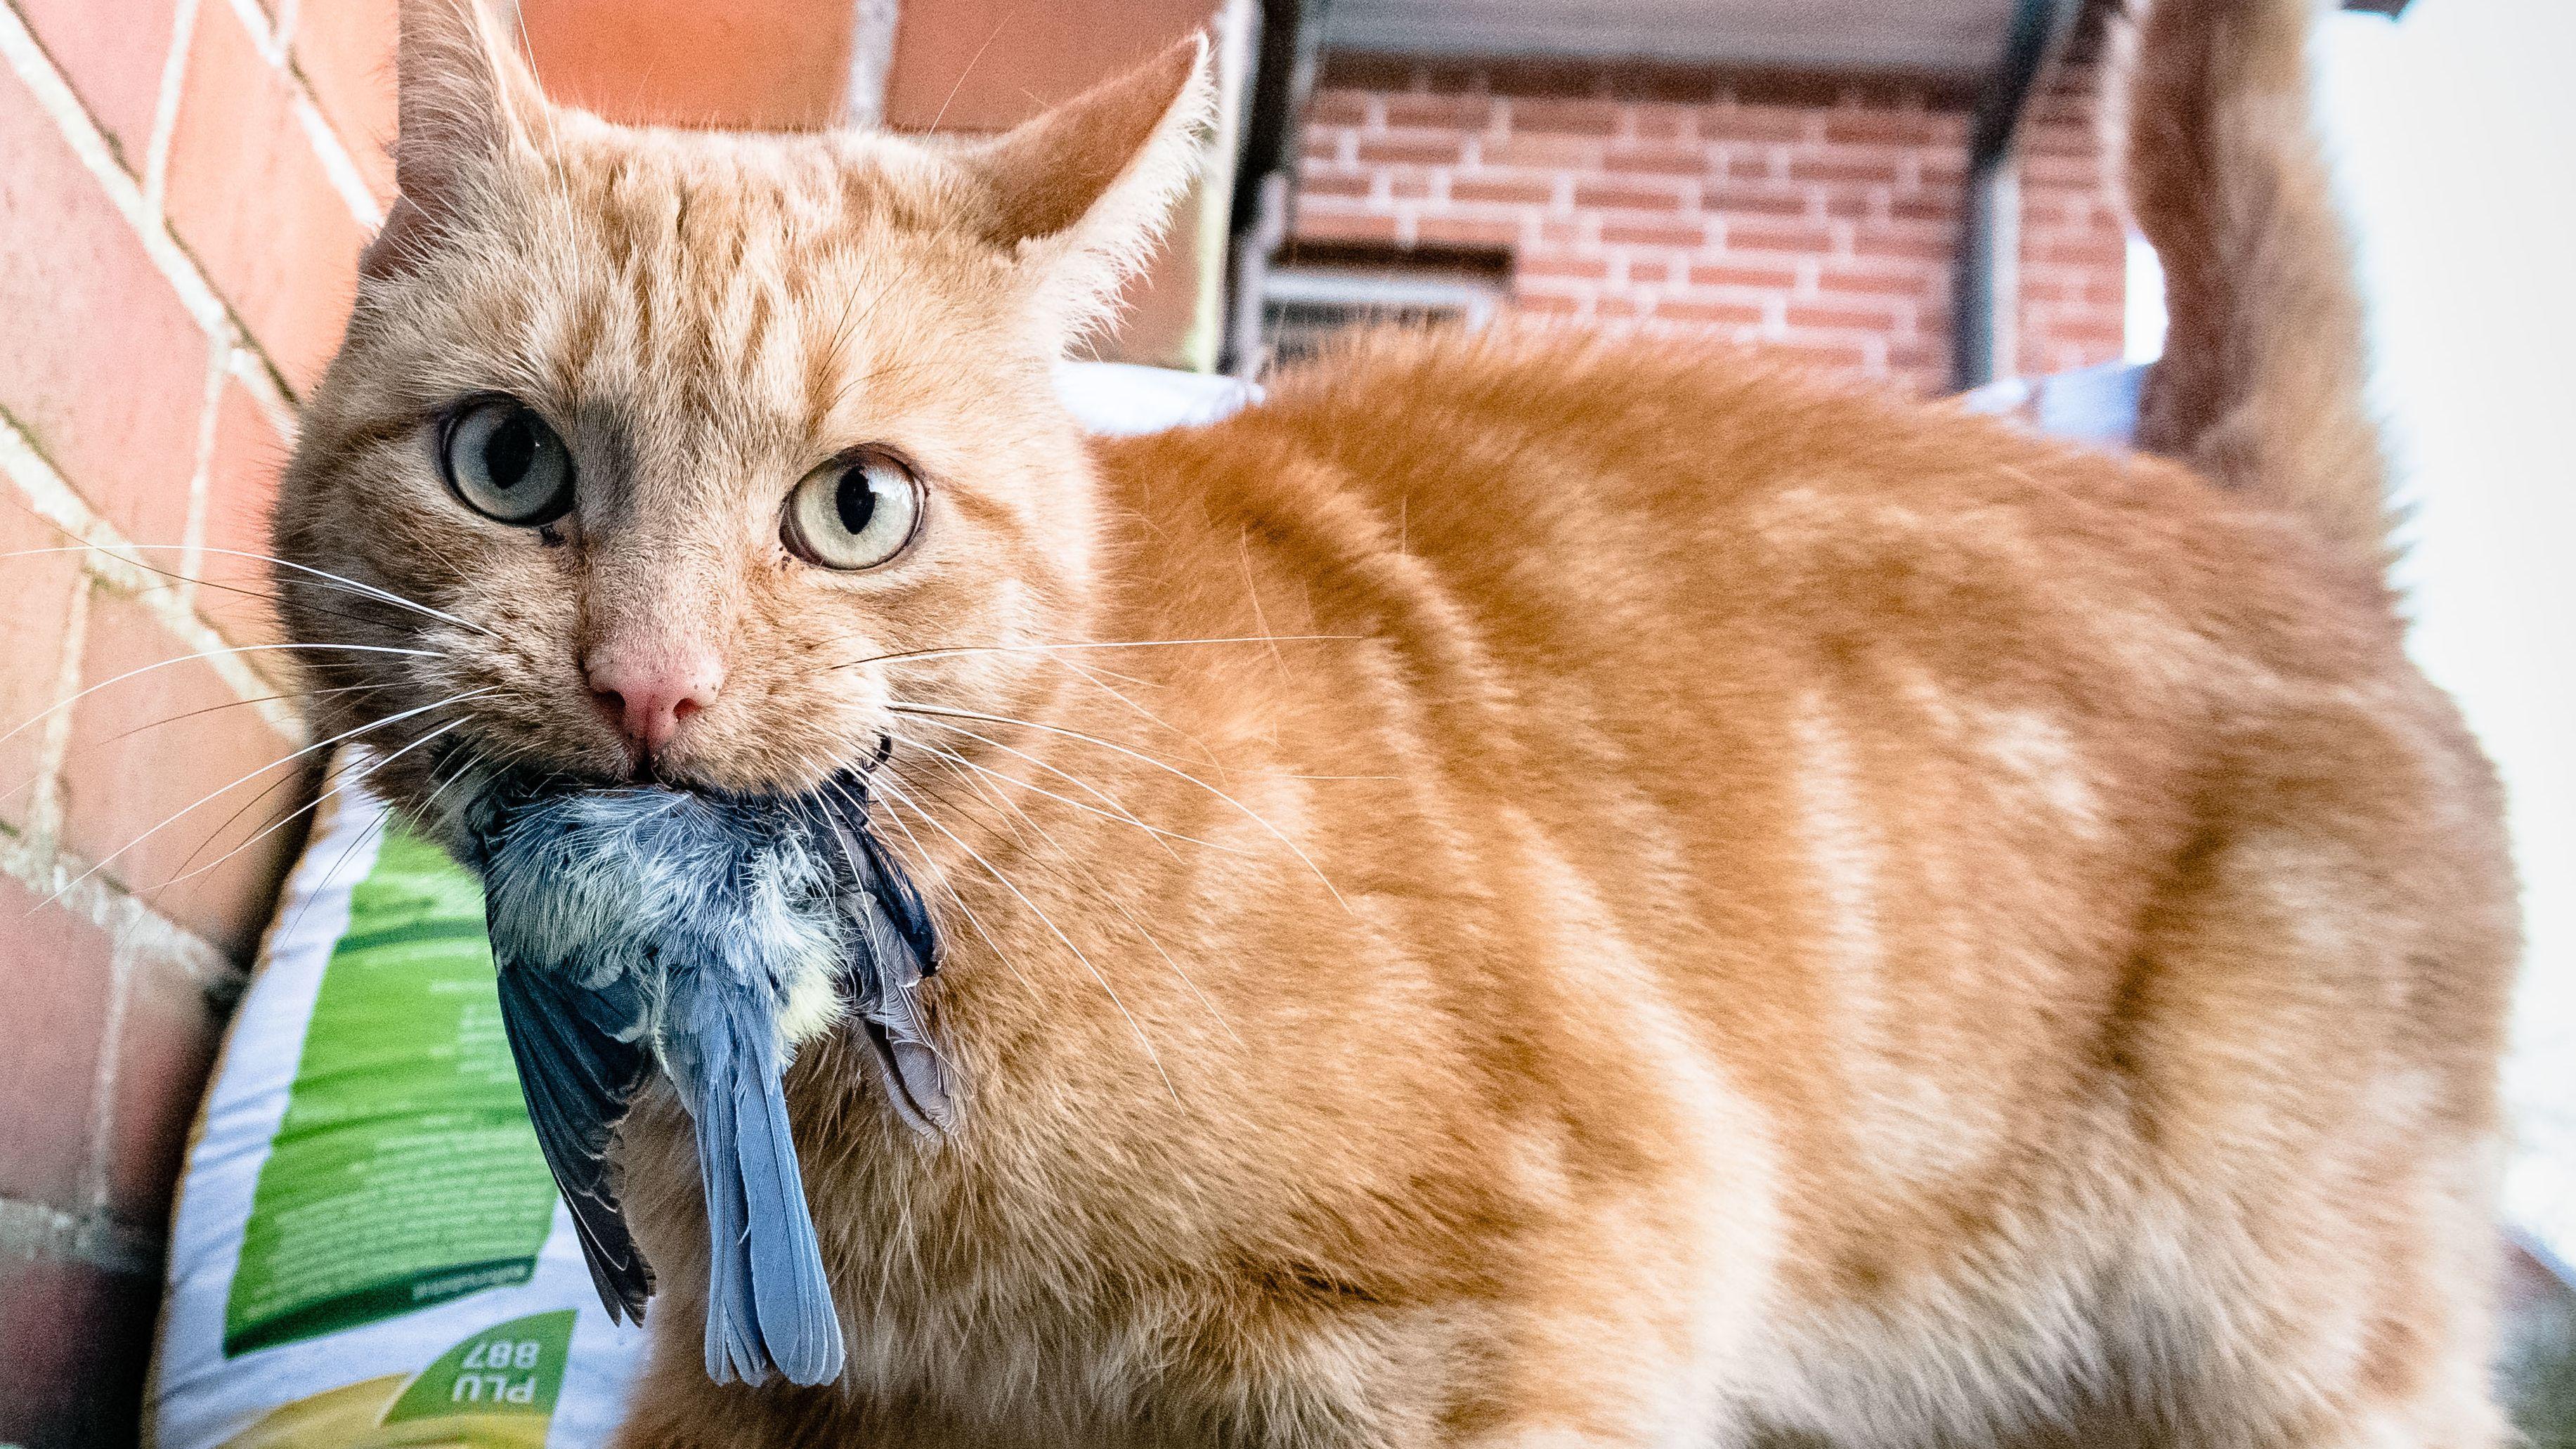 Katze mit Blaumeise im Maul